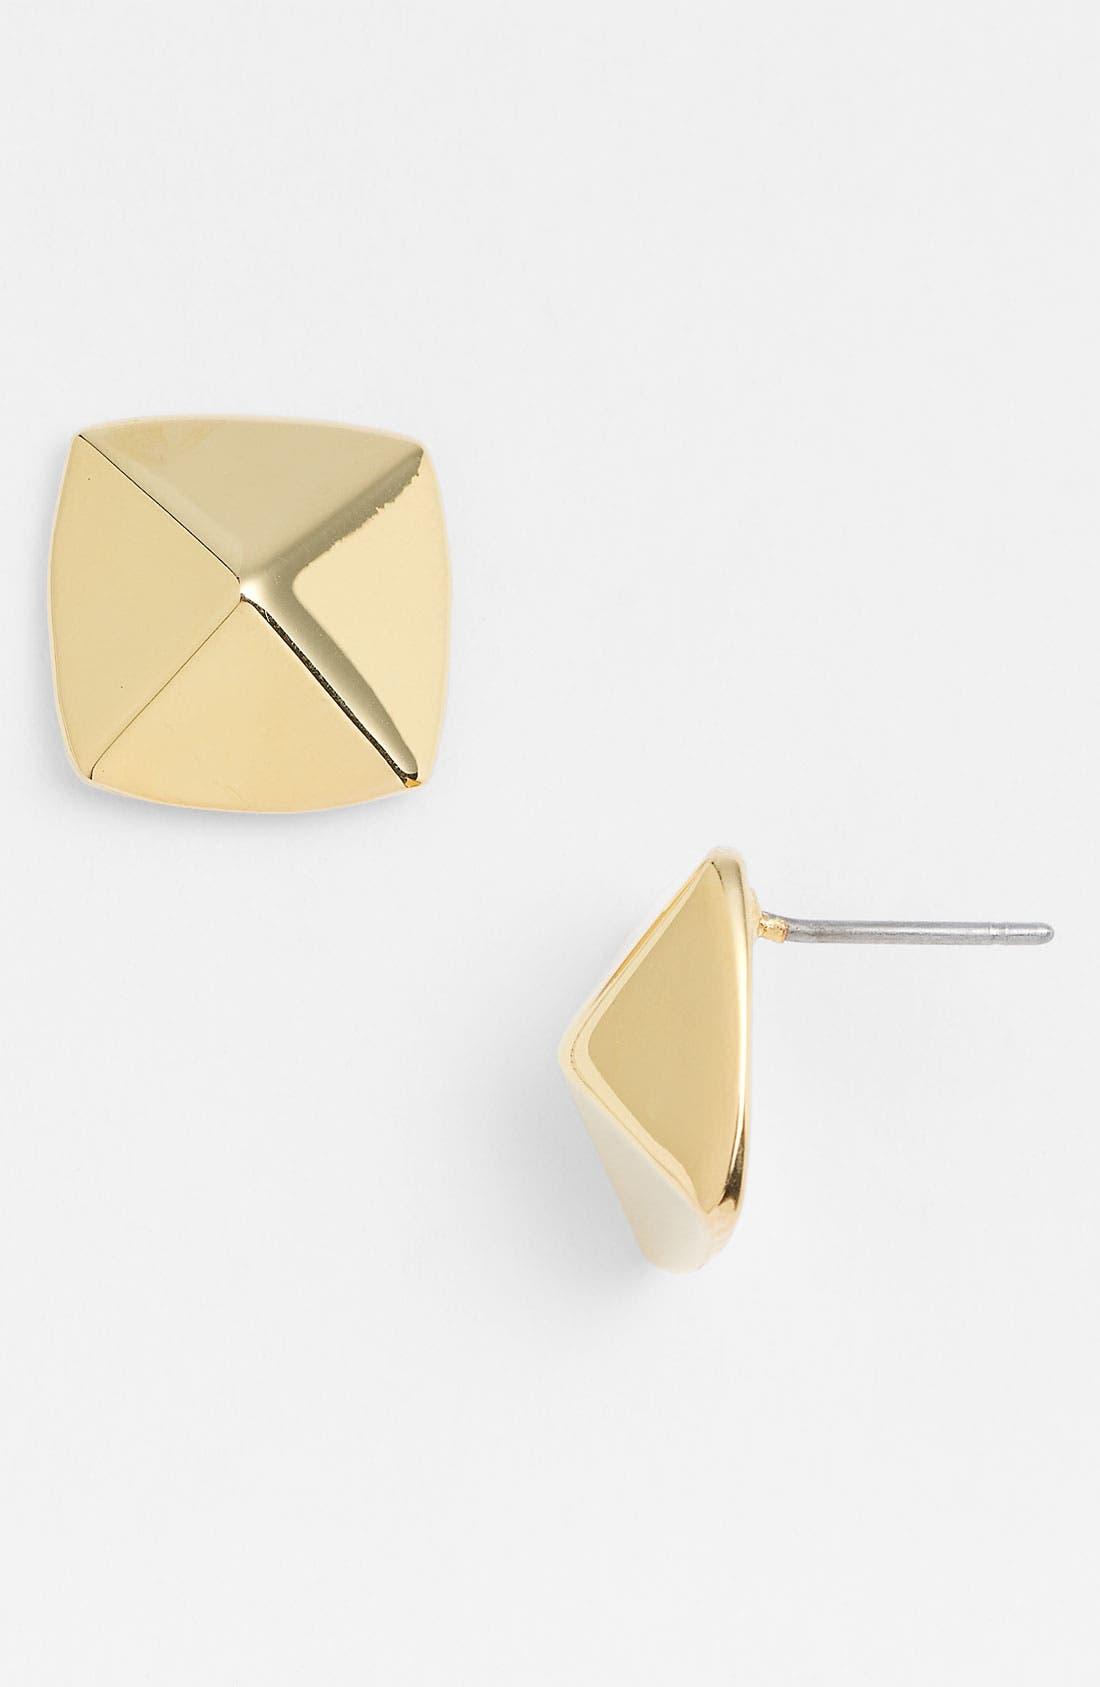 Main Image - Vince Camuto 'Basics' Small Pyramid Stud Earrings